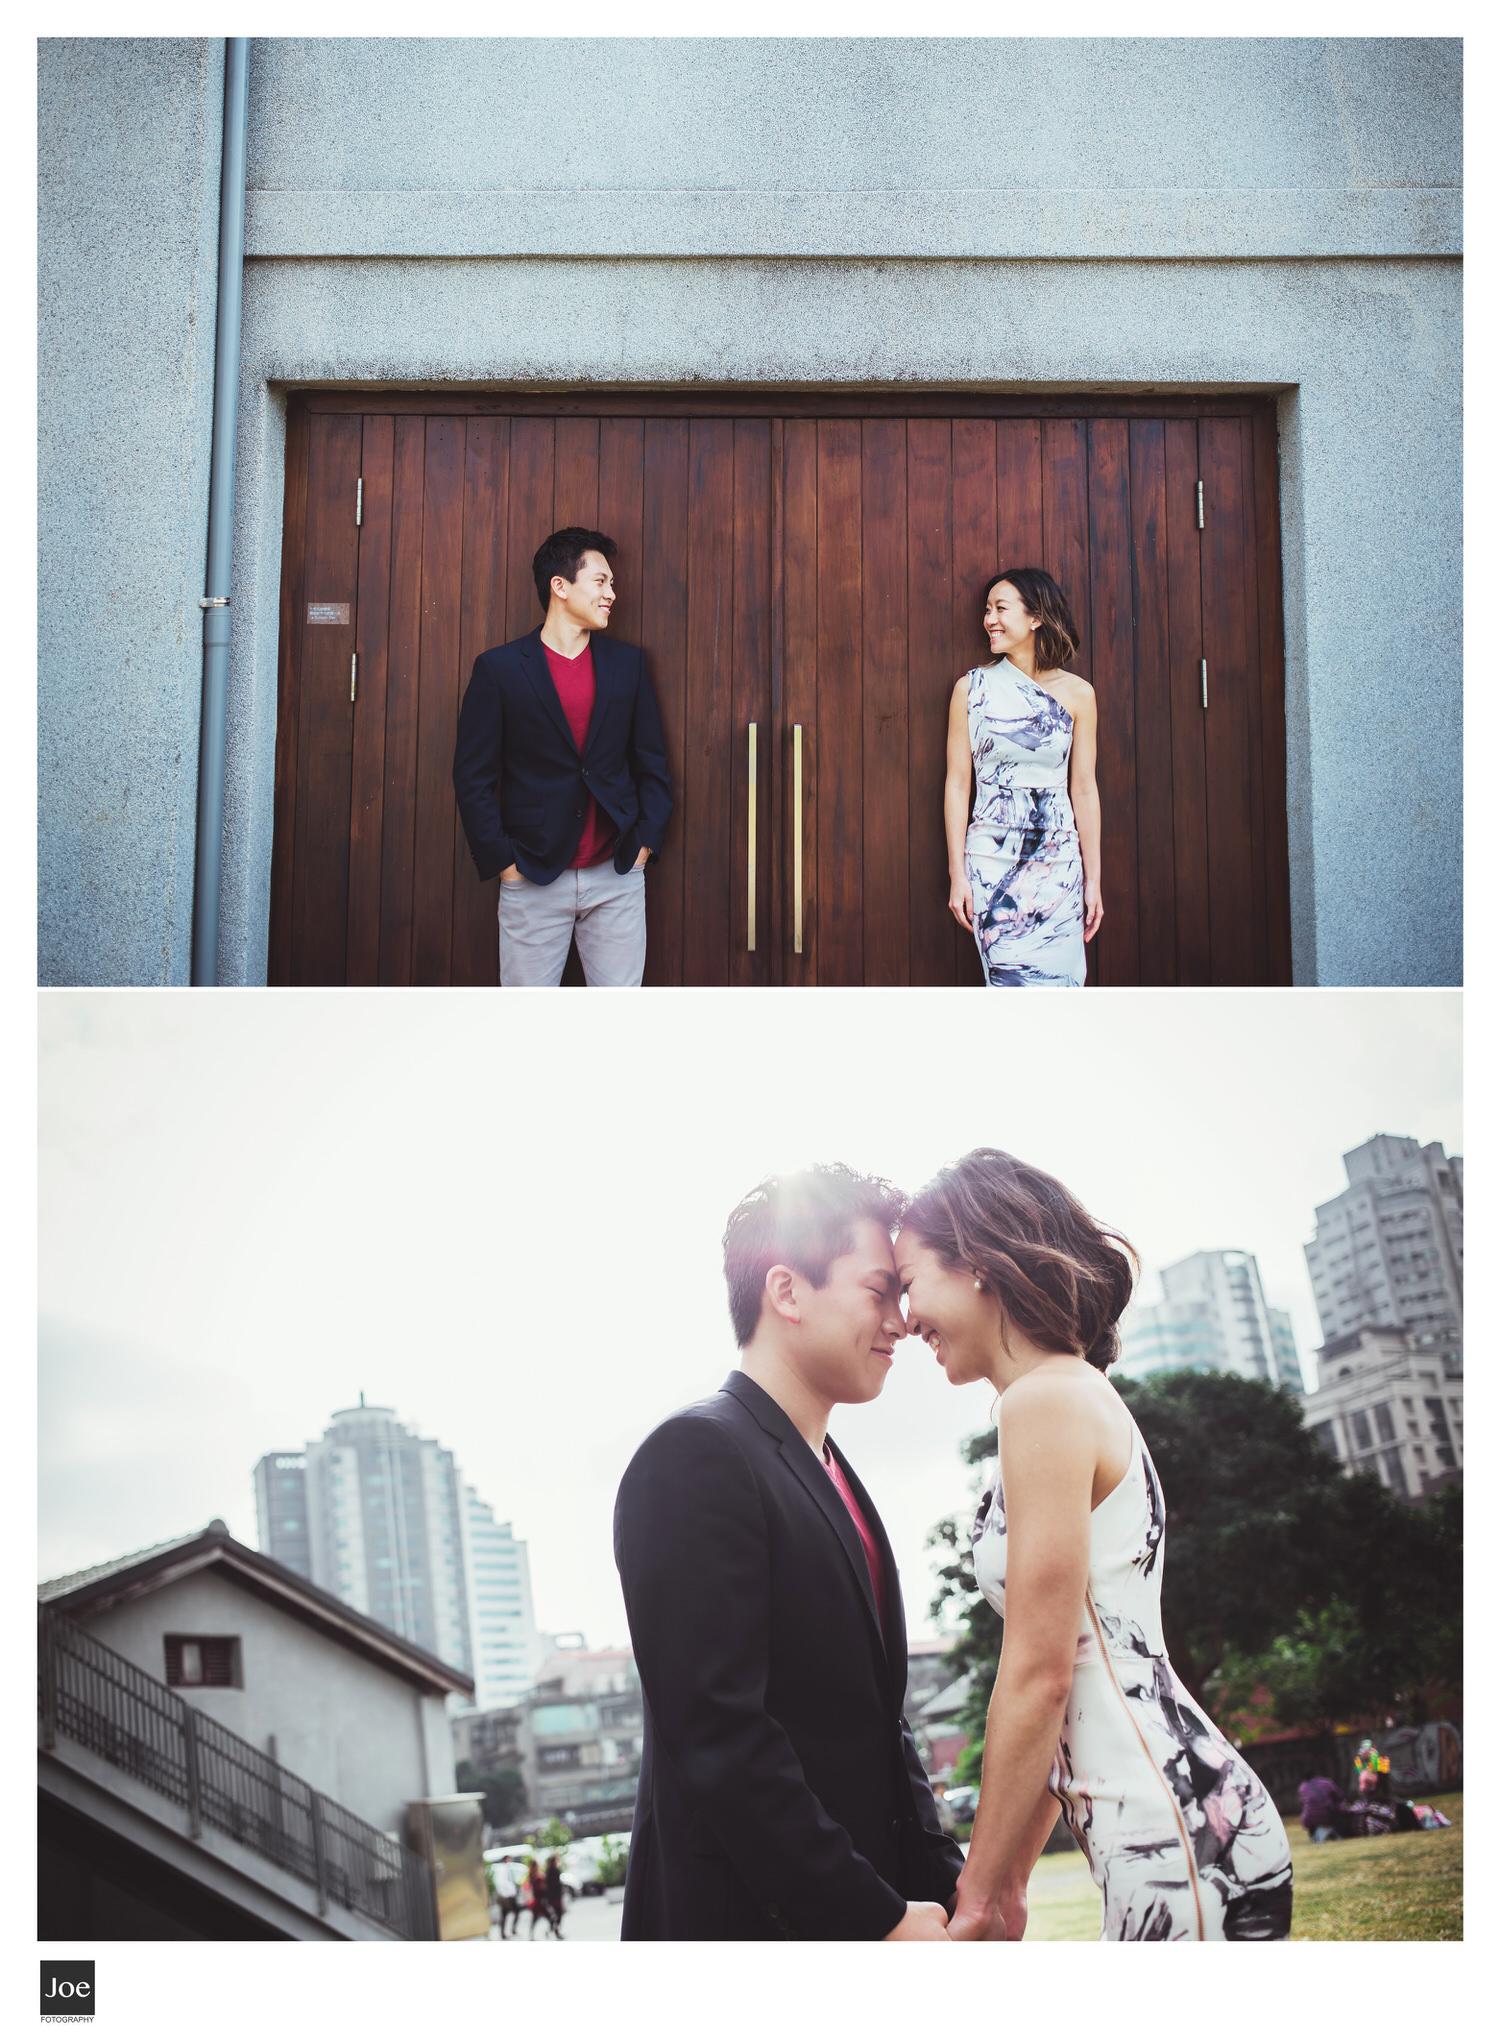 joefotography-taiwan-pre-wedding-annie-aaron-40.jpg